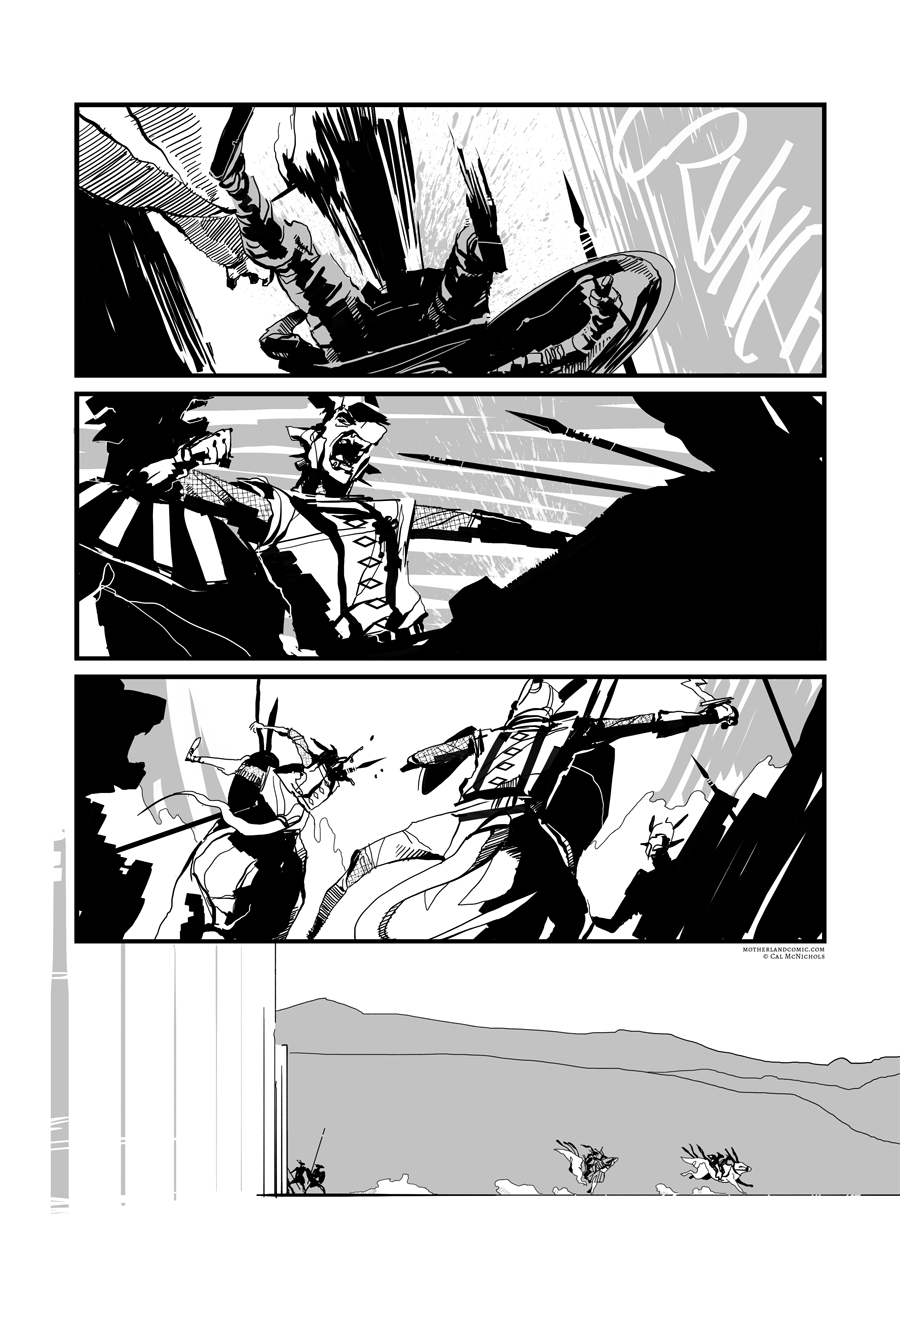 pg 43